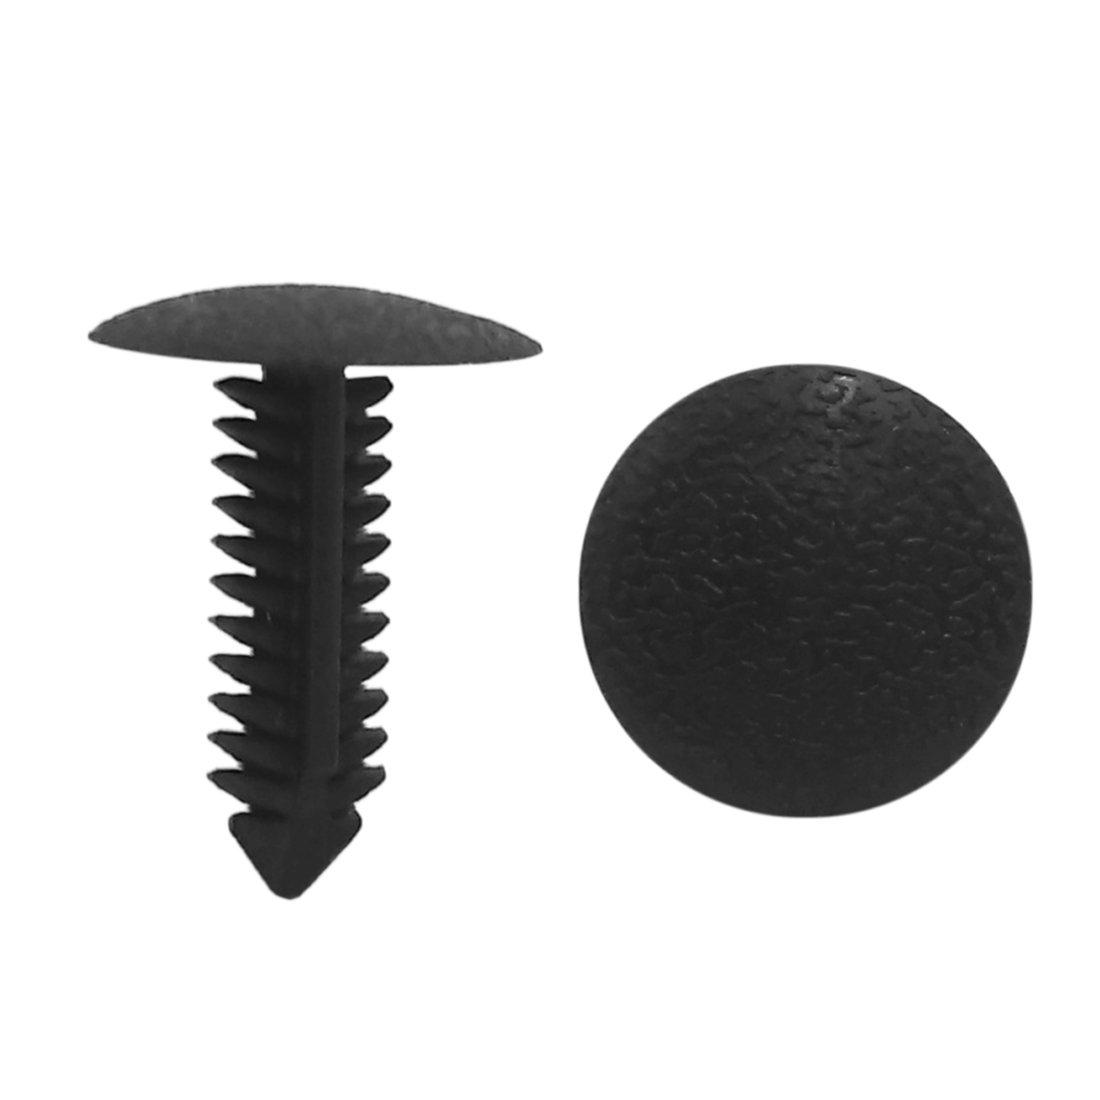 uxcell 50 Pcs 6mm Black Hole Car Door Plastic Rivet Fastener Trim Panel Retainer Clips